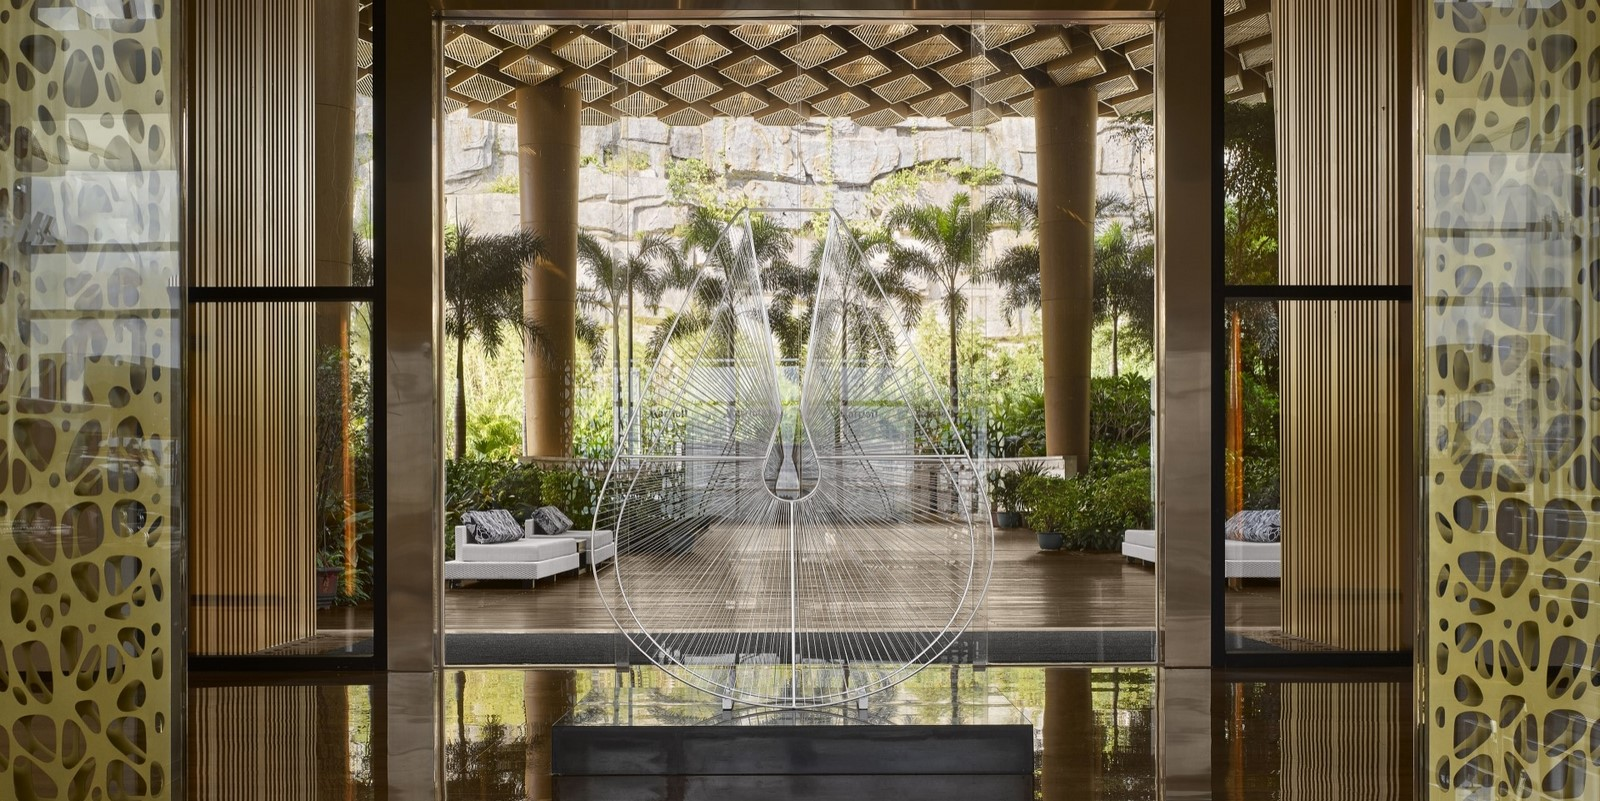 A look at Marriott Hotel's Interiors - Sheet3